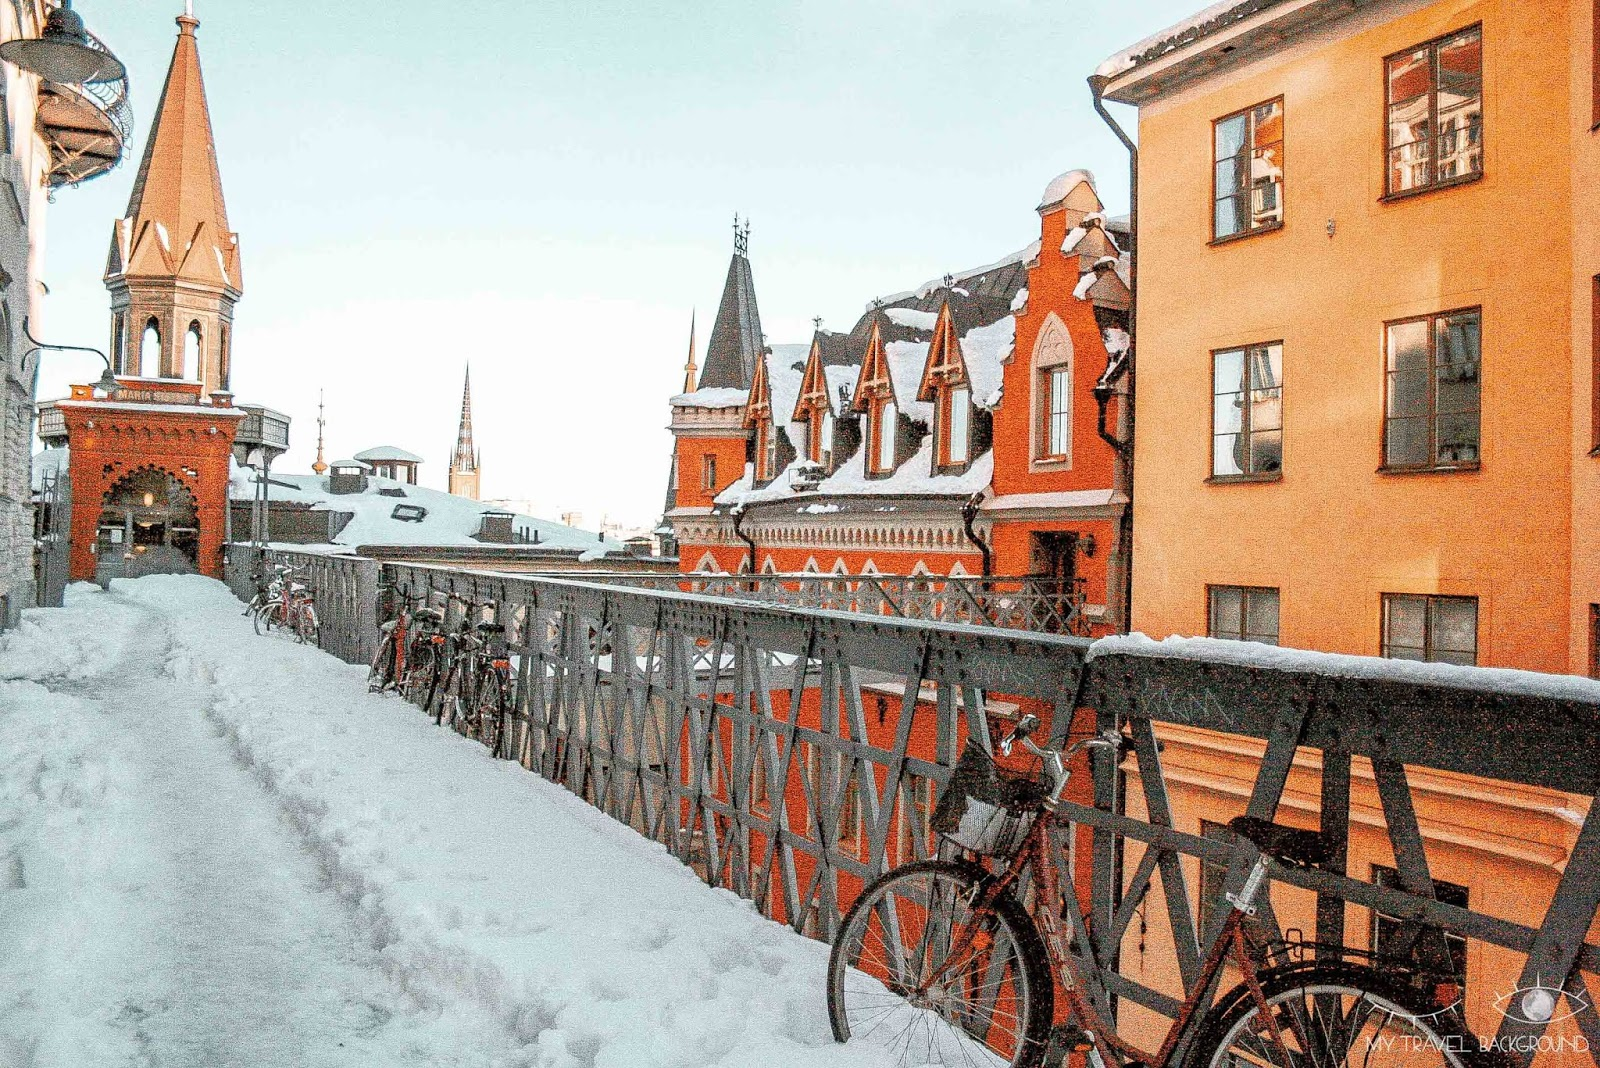 My Travel Background : Visiter Stockholm, mes immanquables - Sodermalm